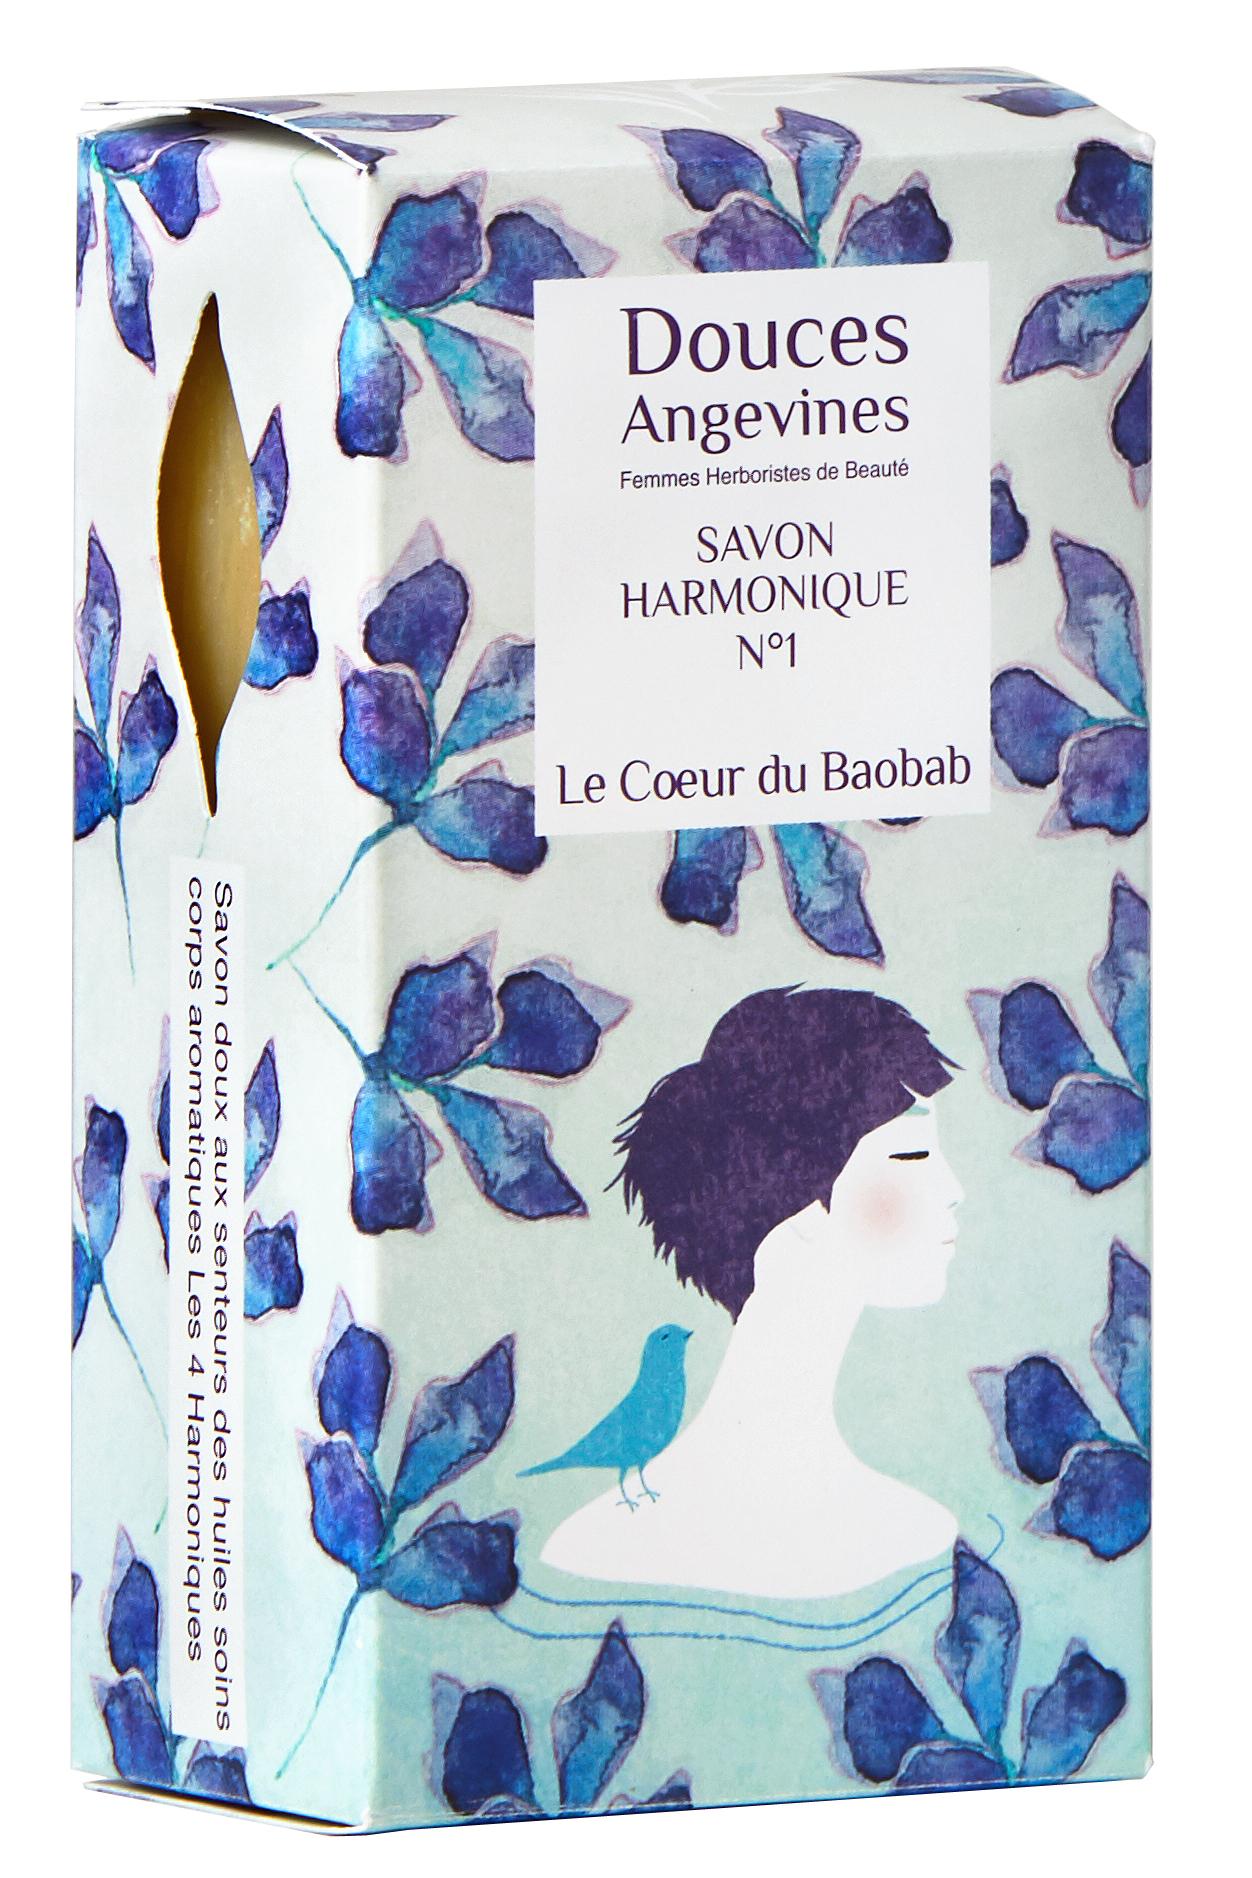 Douces-angevines-Savon-Harmonique1